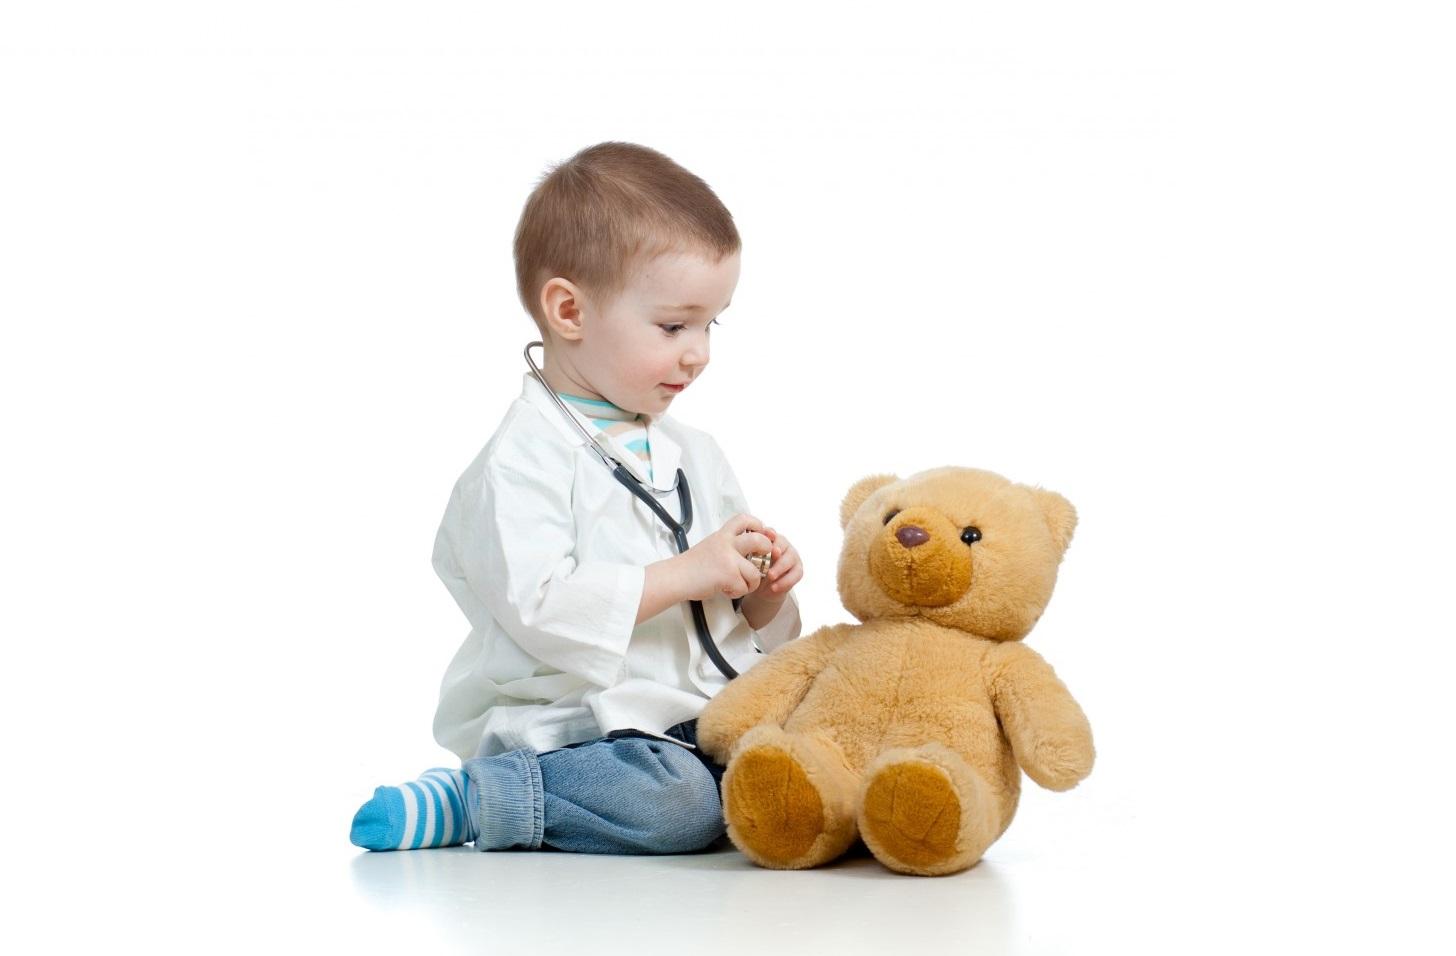 преглед дете доктор болести лекар